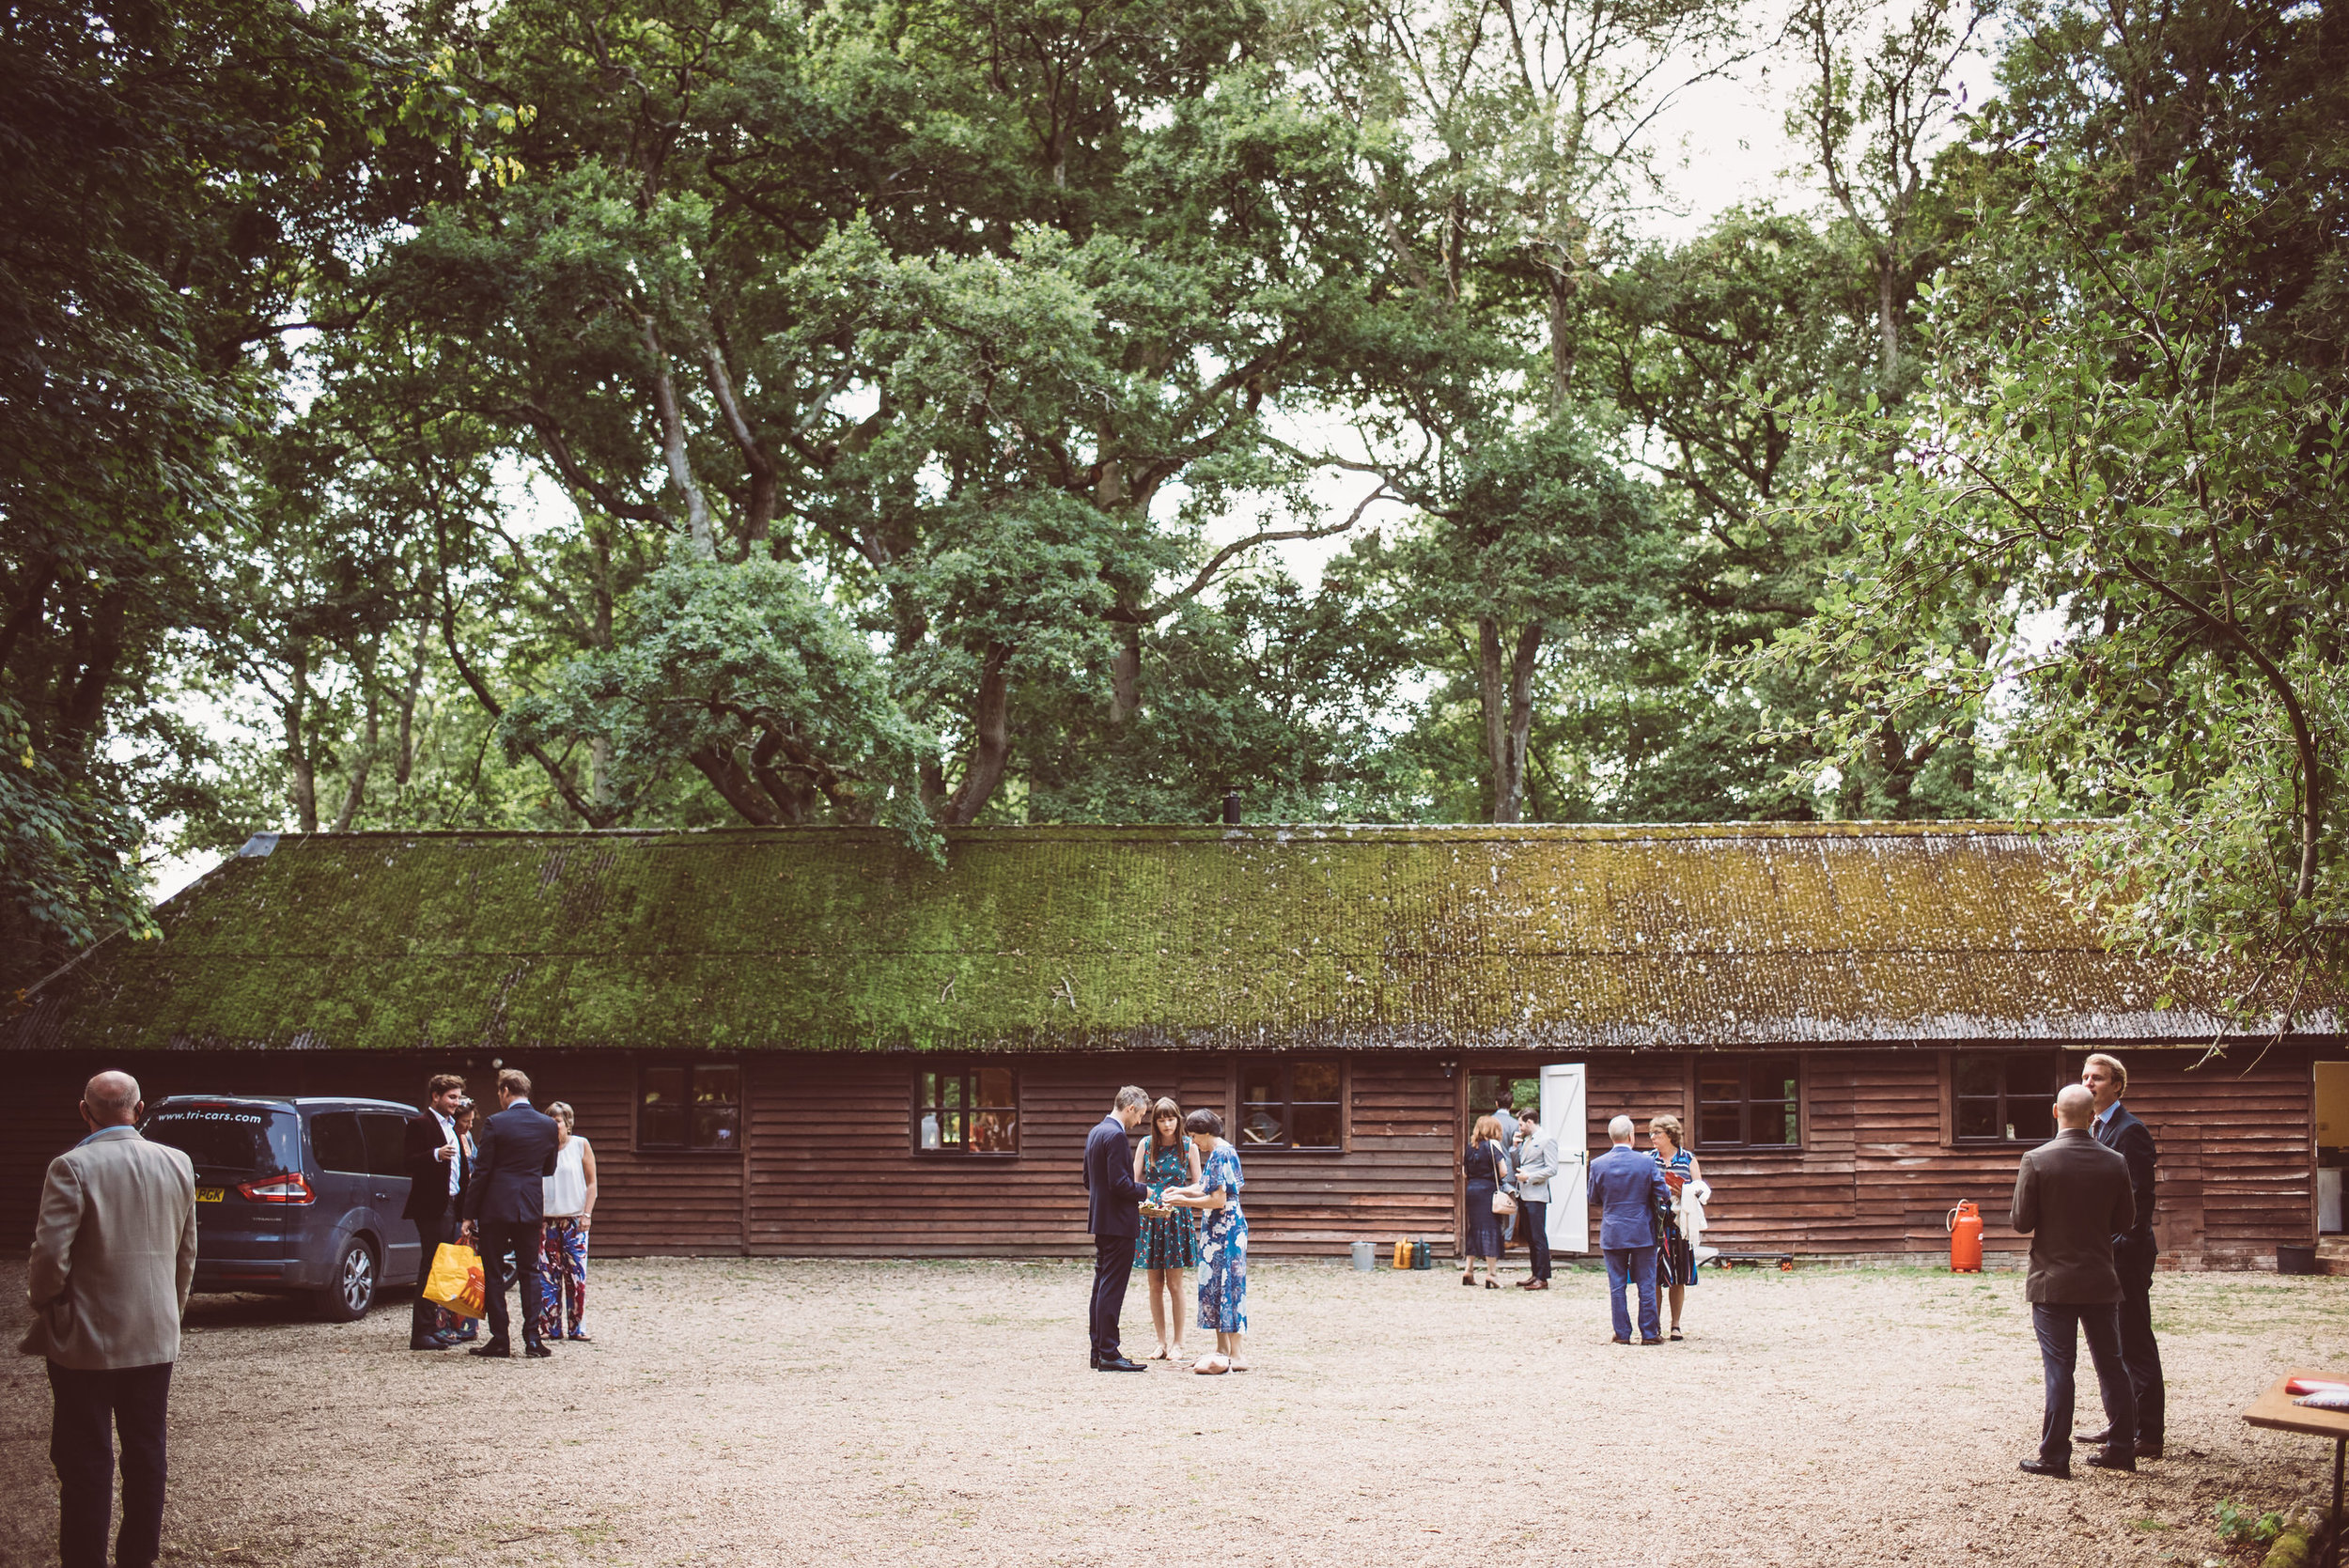 knepp-castle-boho-outdoor-wedding-64.jpg